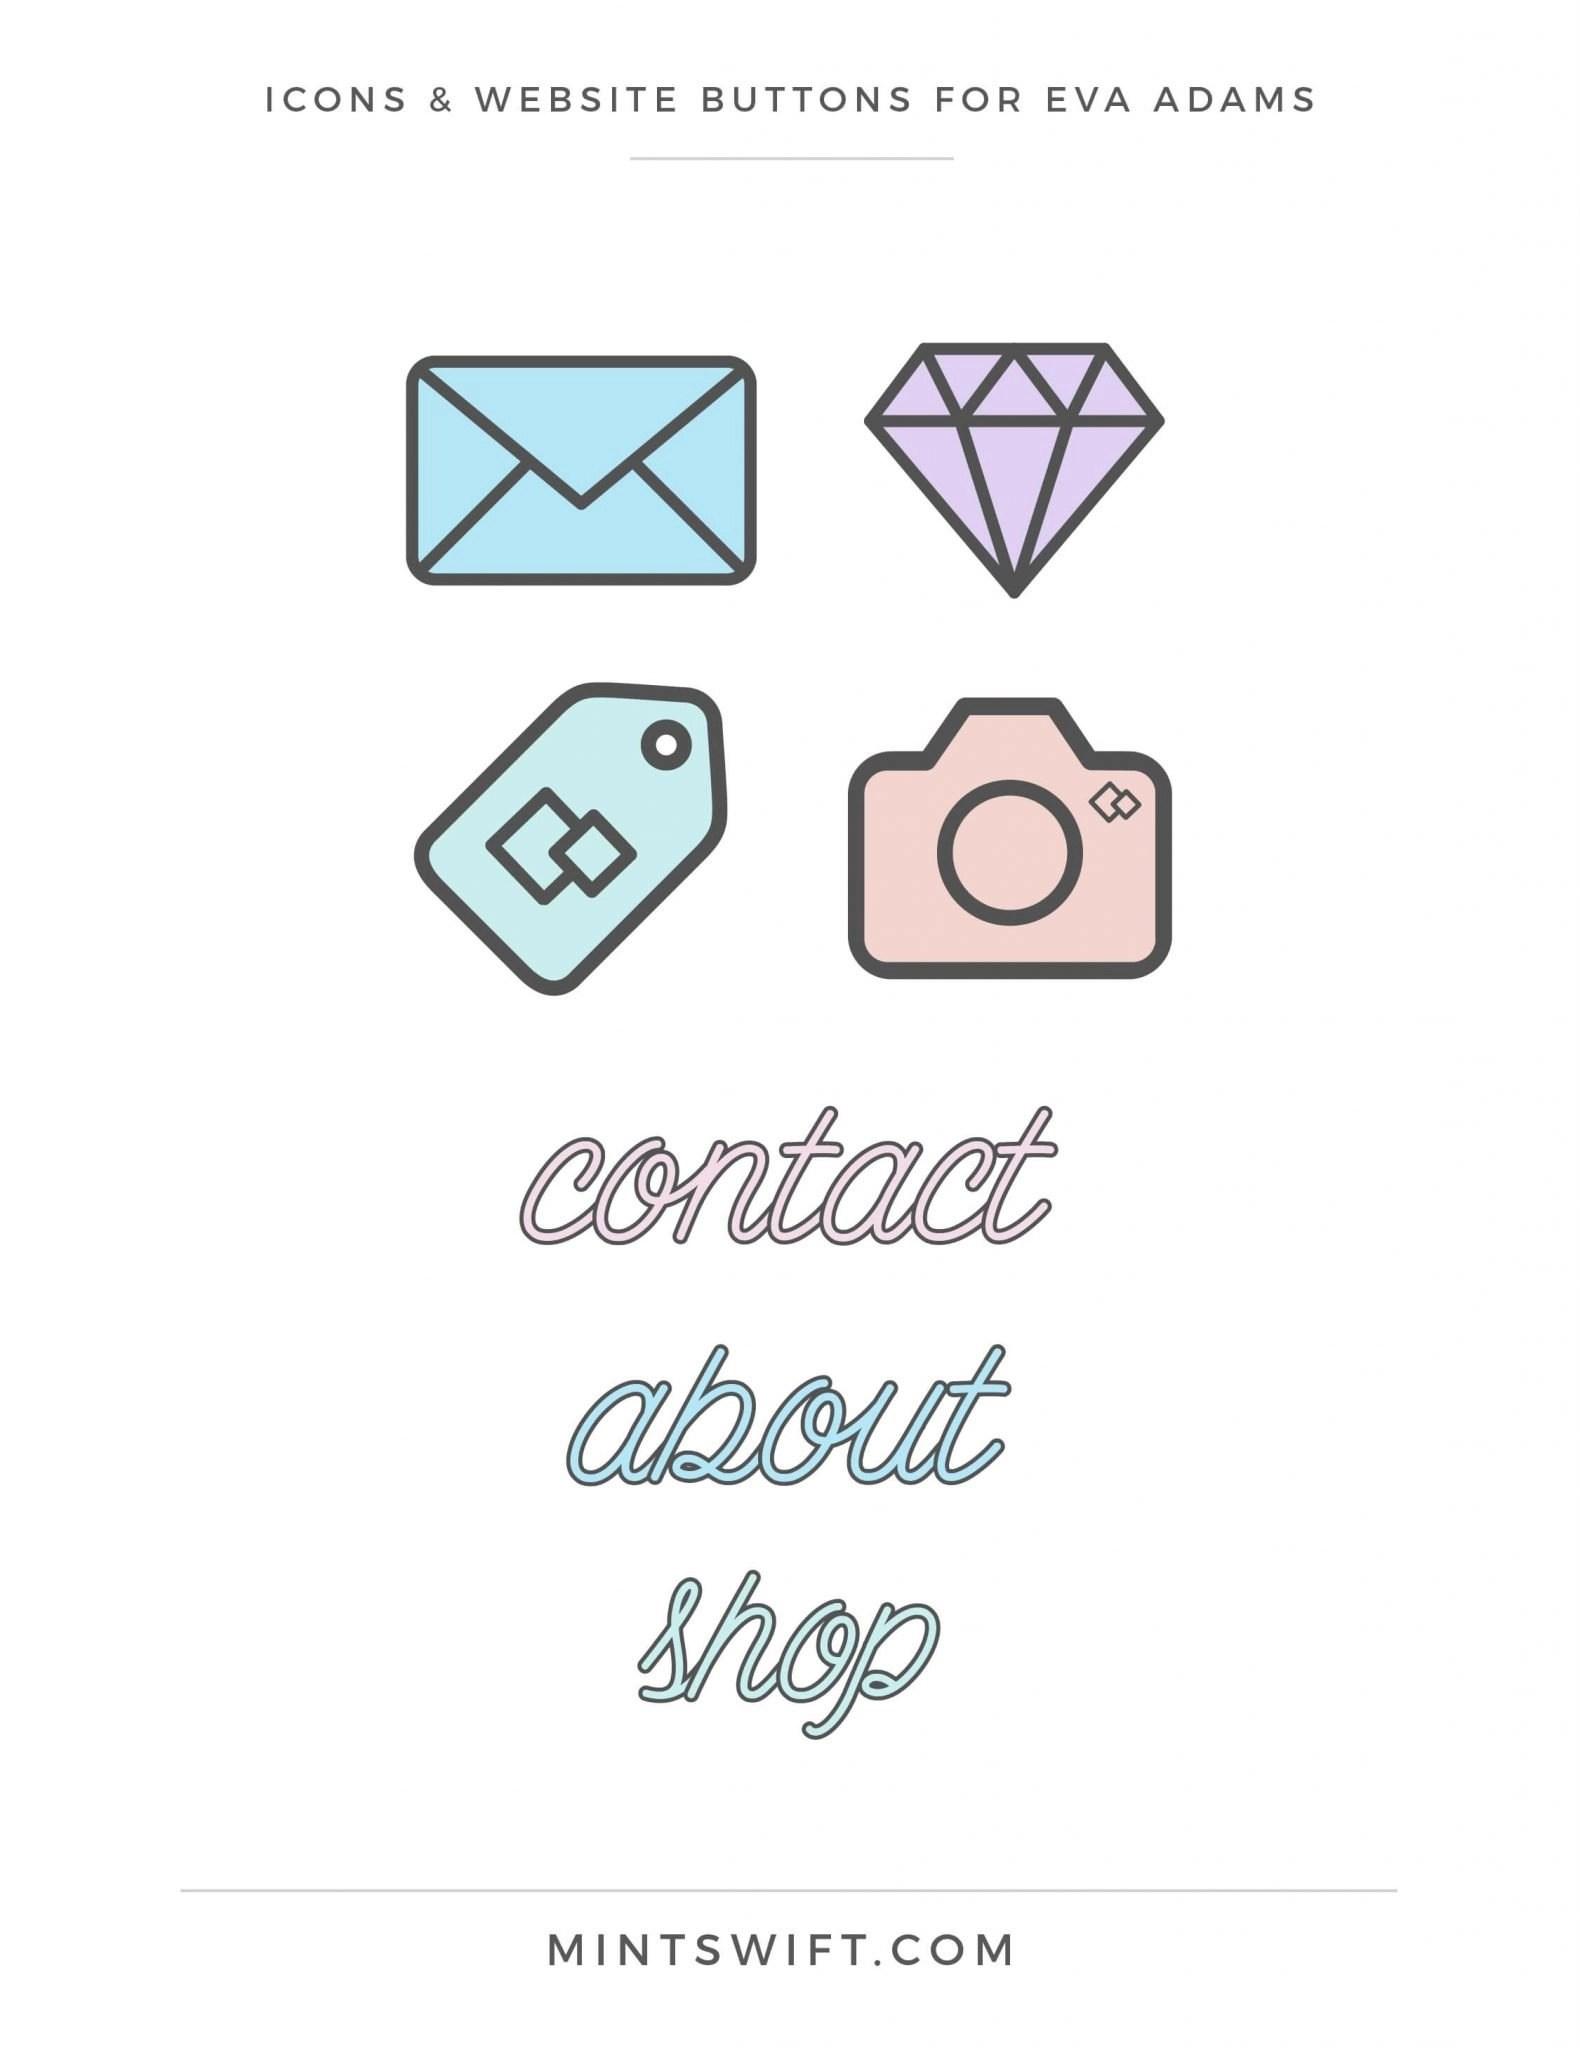 Eva Adams - Icons & Website buttons - MintSwift